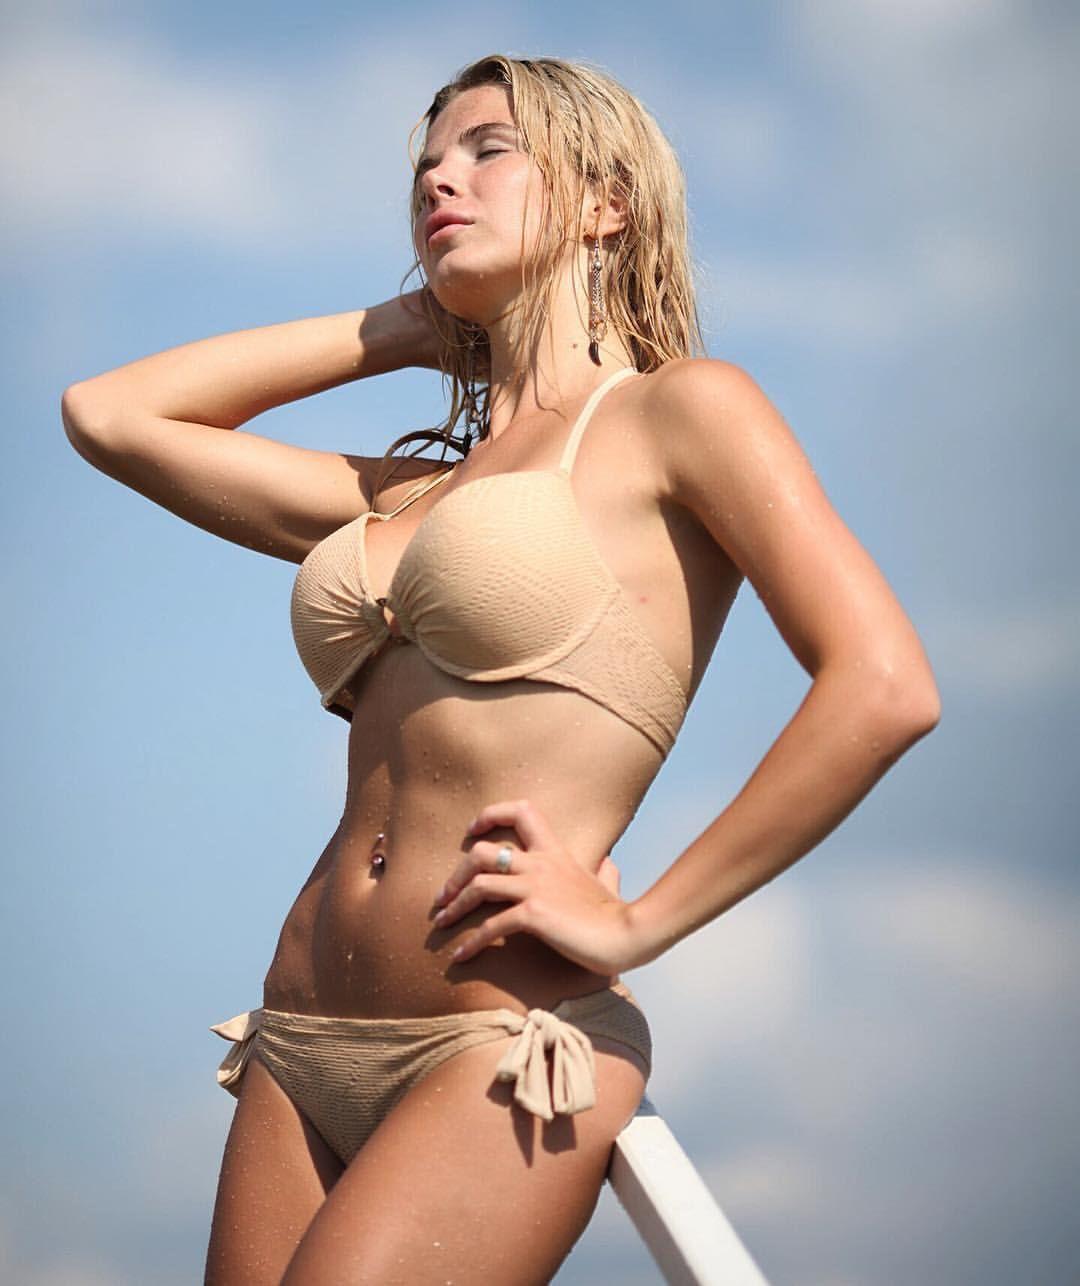 Free nudist beach pics photos